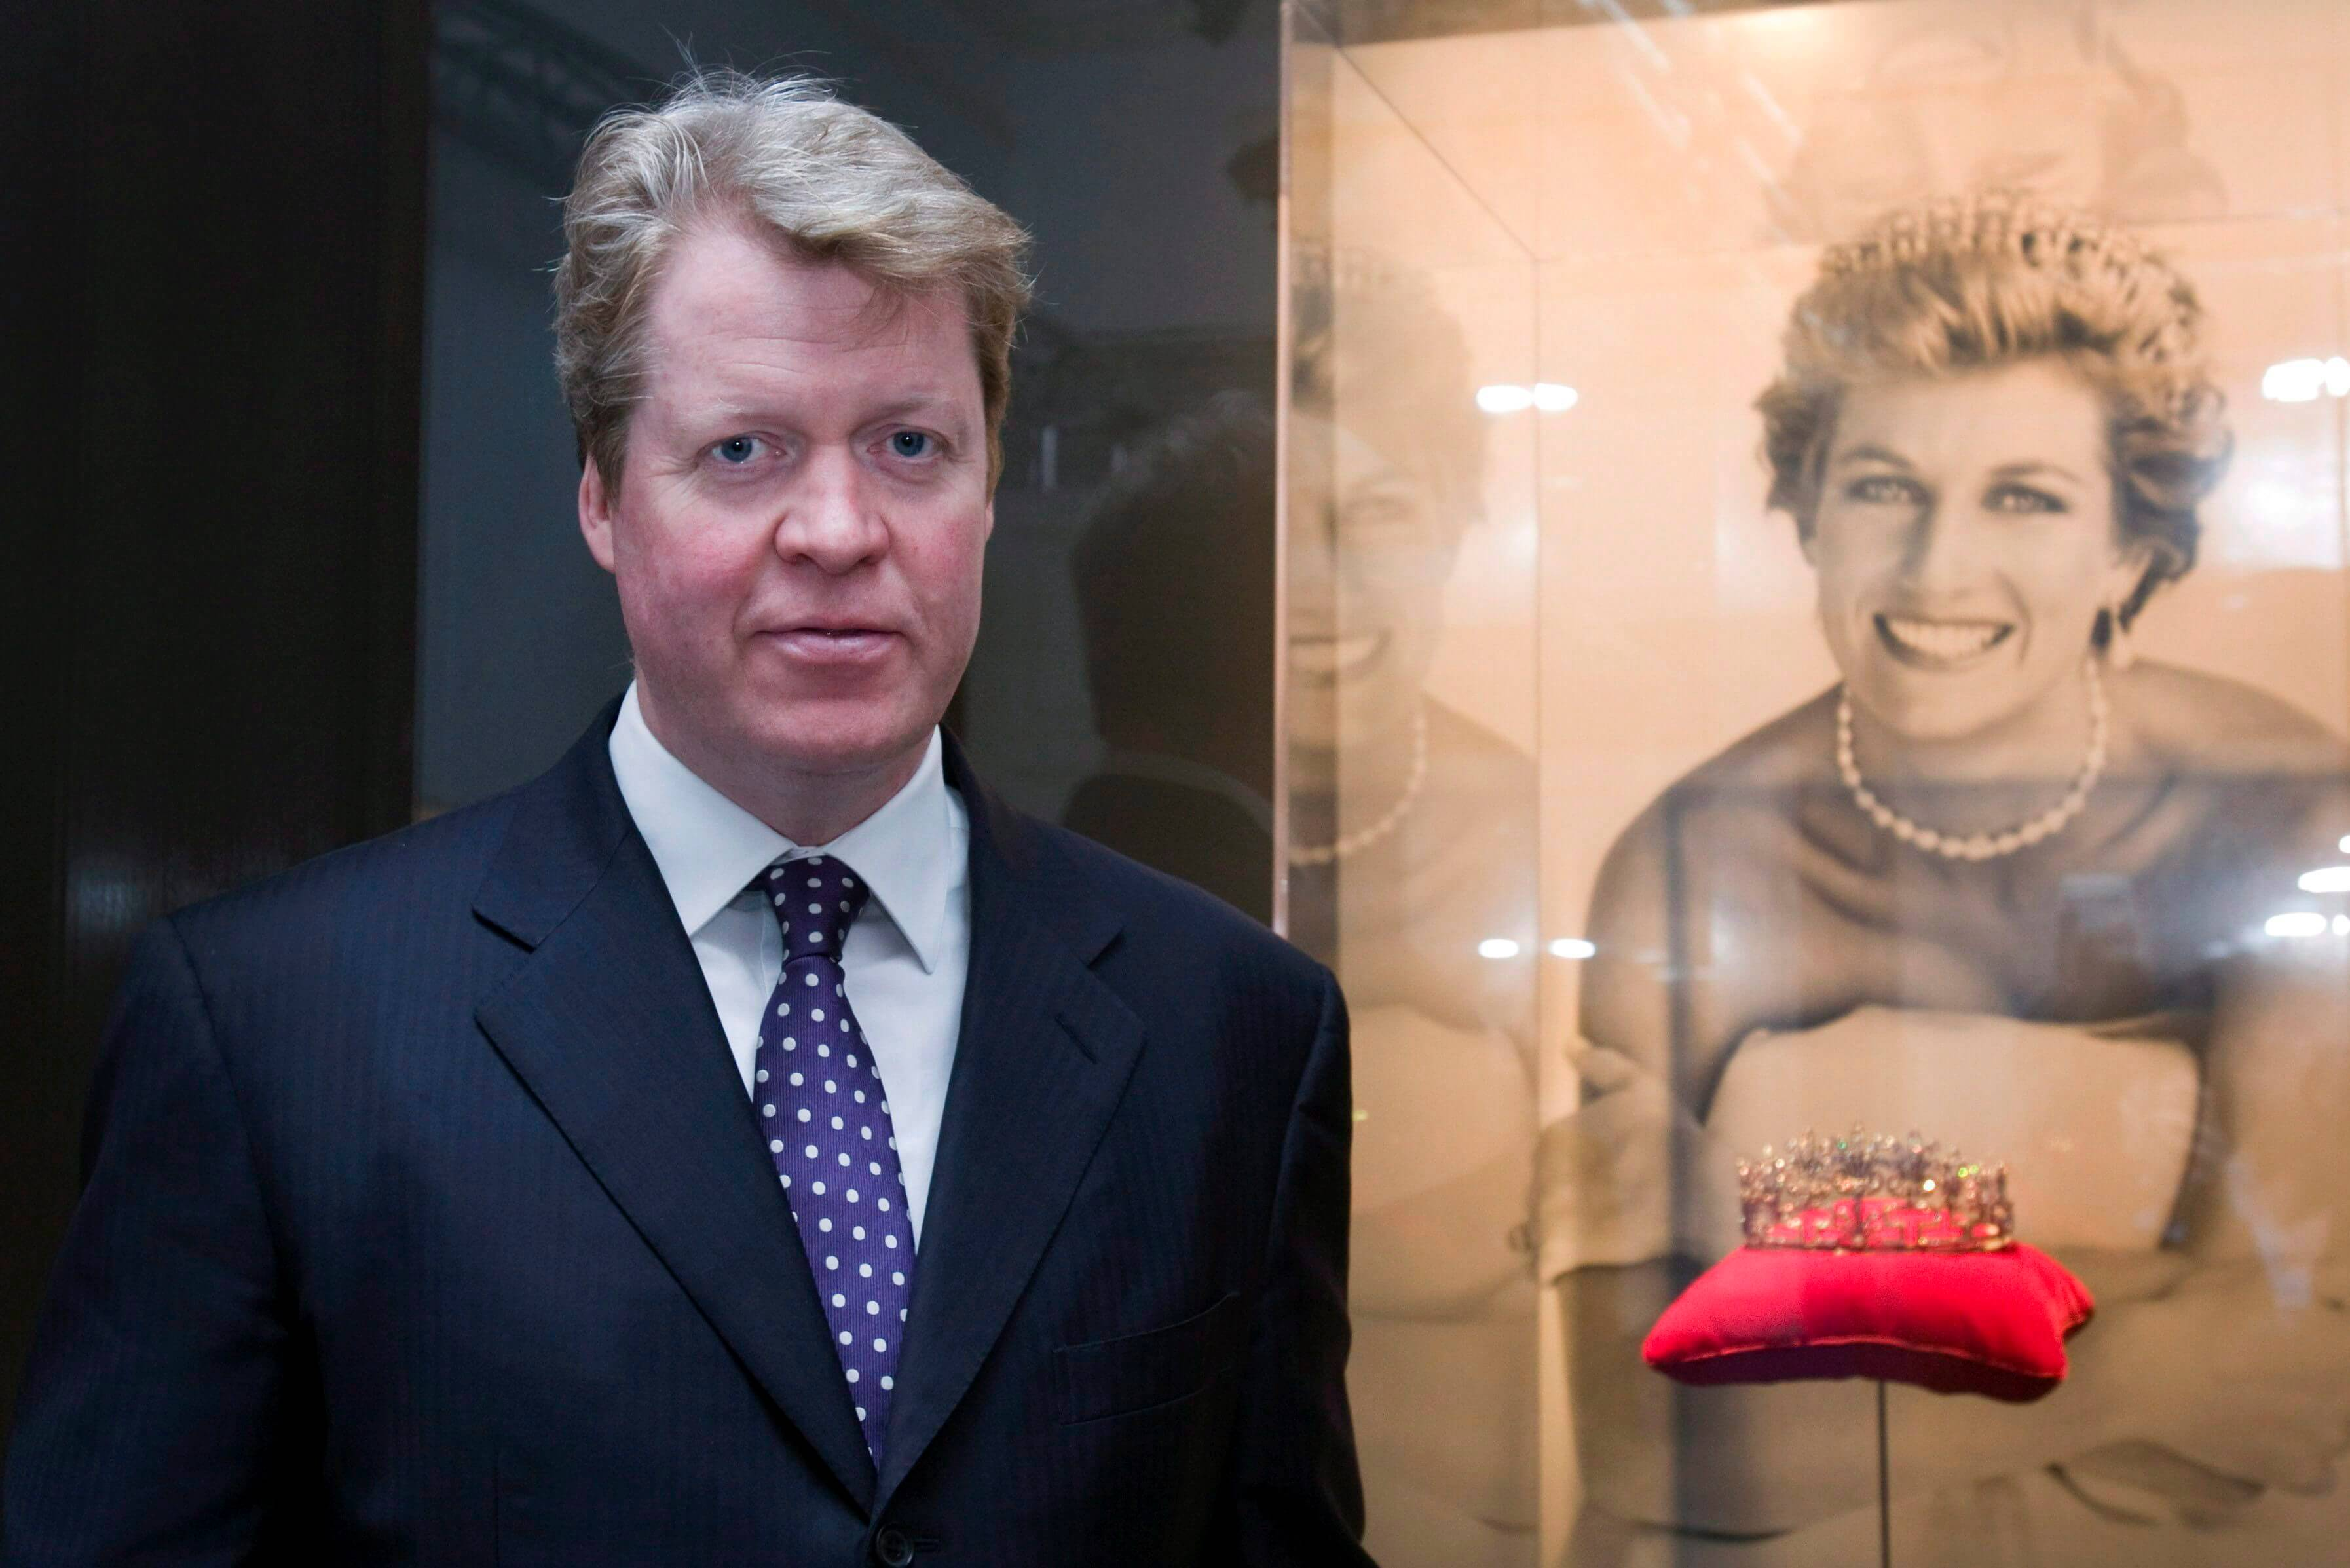 Charles Spencer: Altes Bild erinnert an Prinzessin Diana